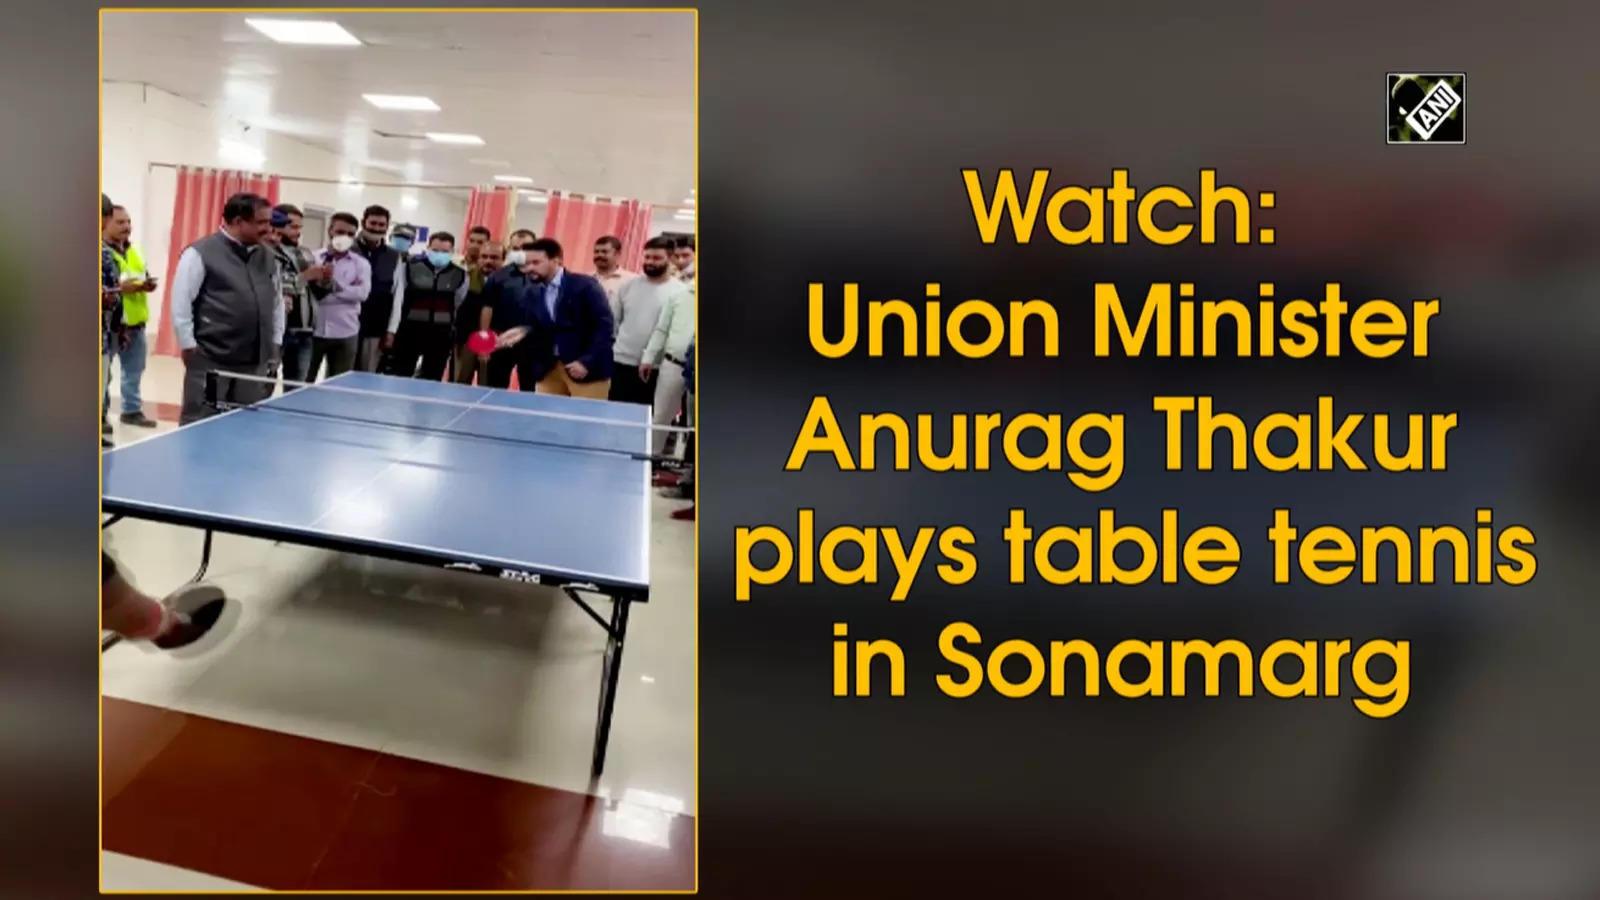 watch-union-minister-anurag-thakur-plays-table-tennis-in-sonamarg